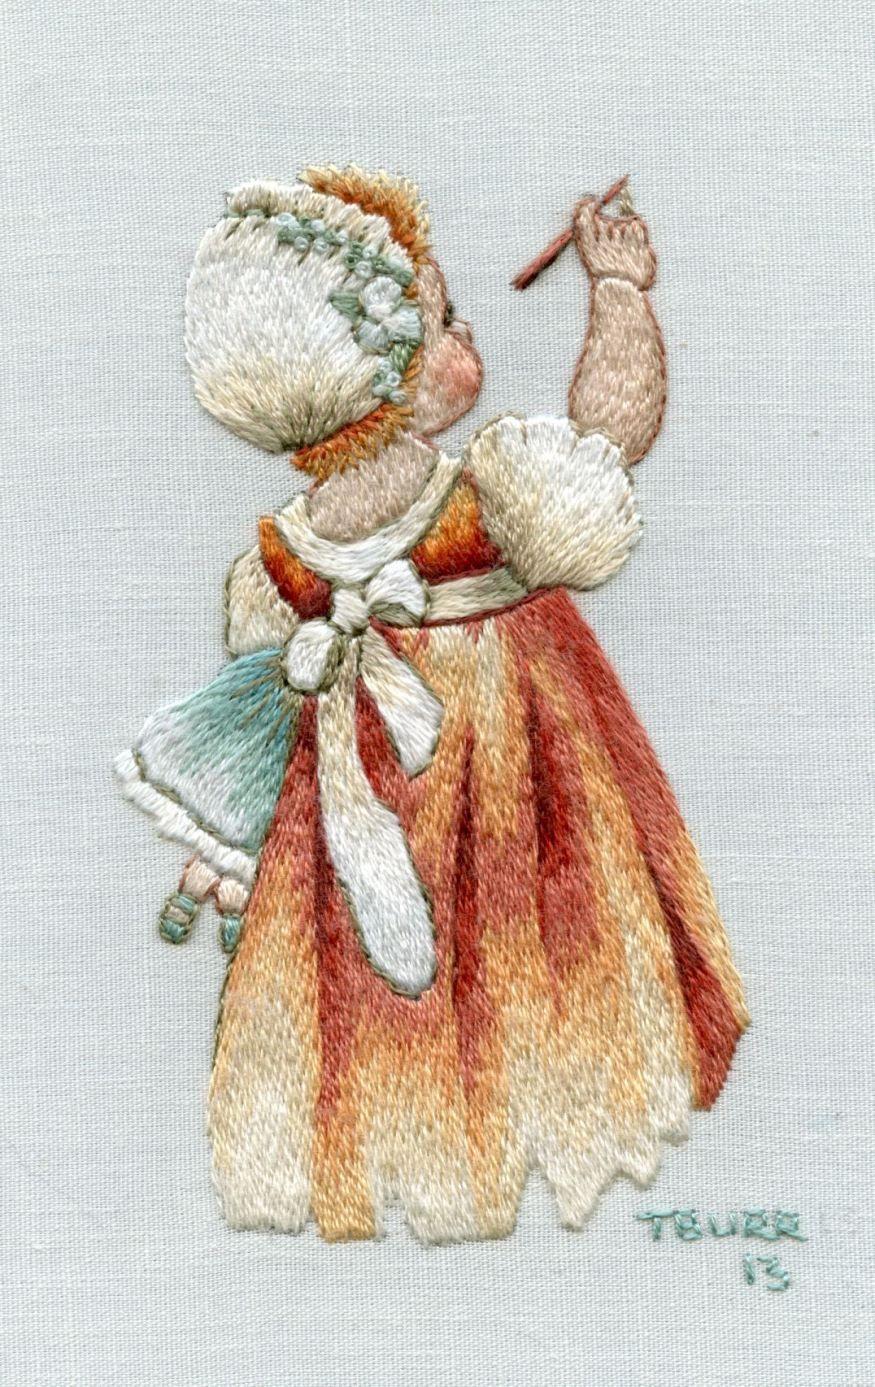 Miniature needle painting trish burr embroidery